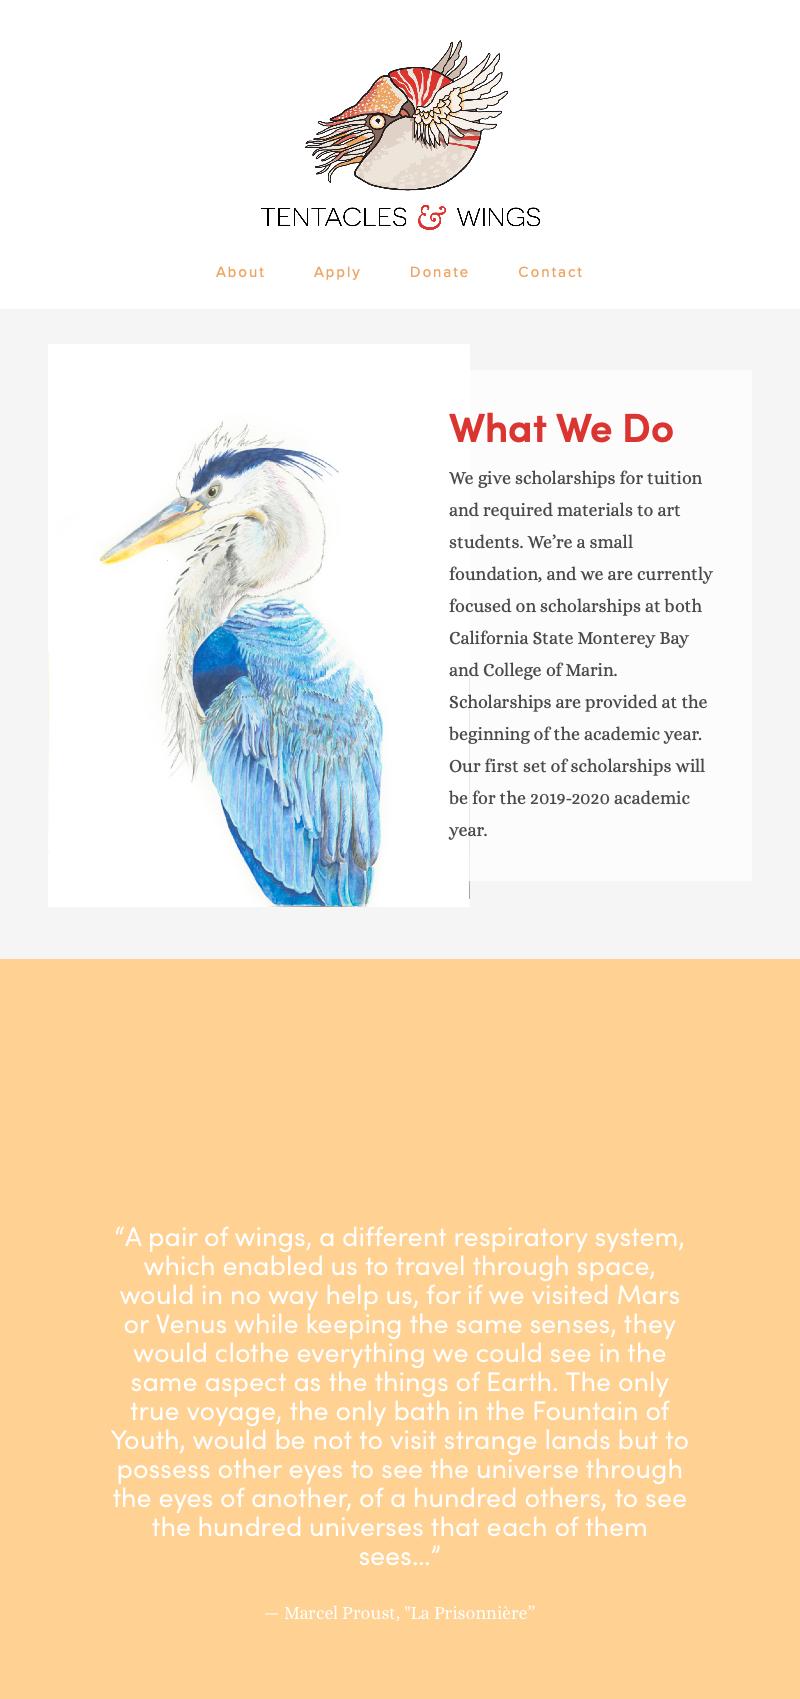 Screenshots from the website